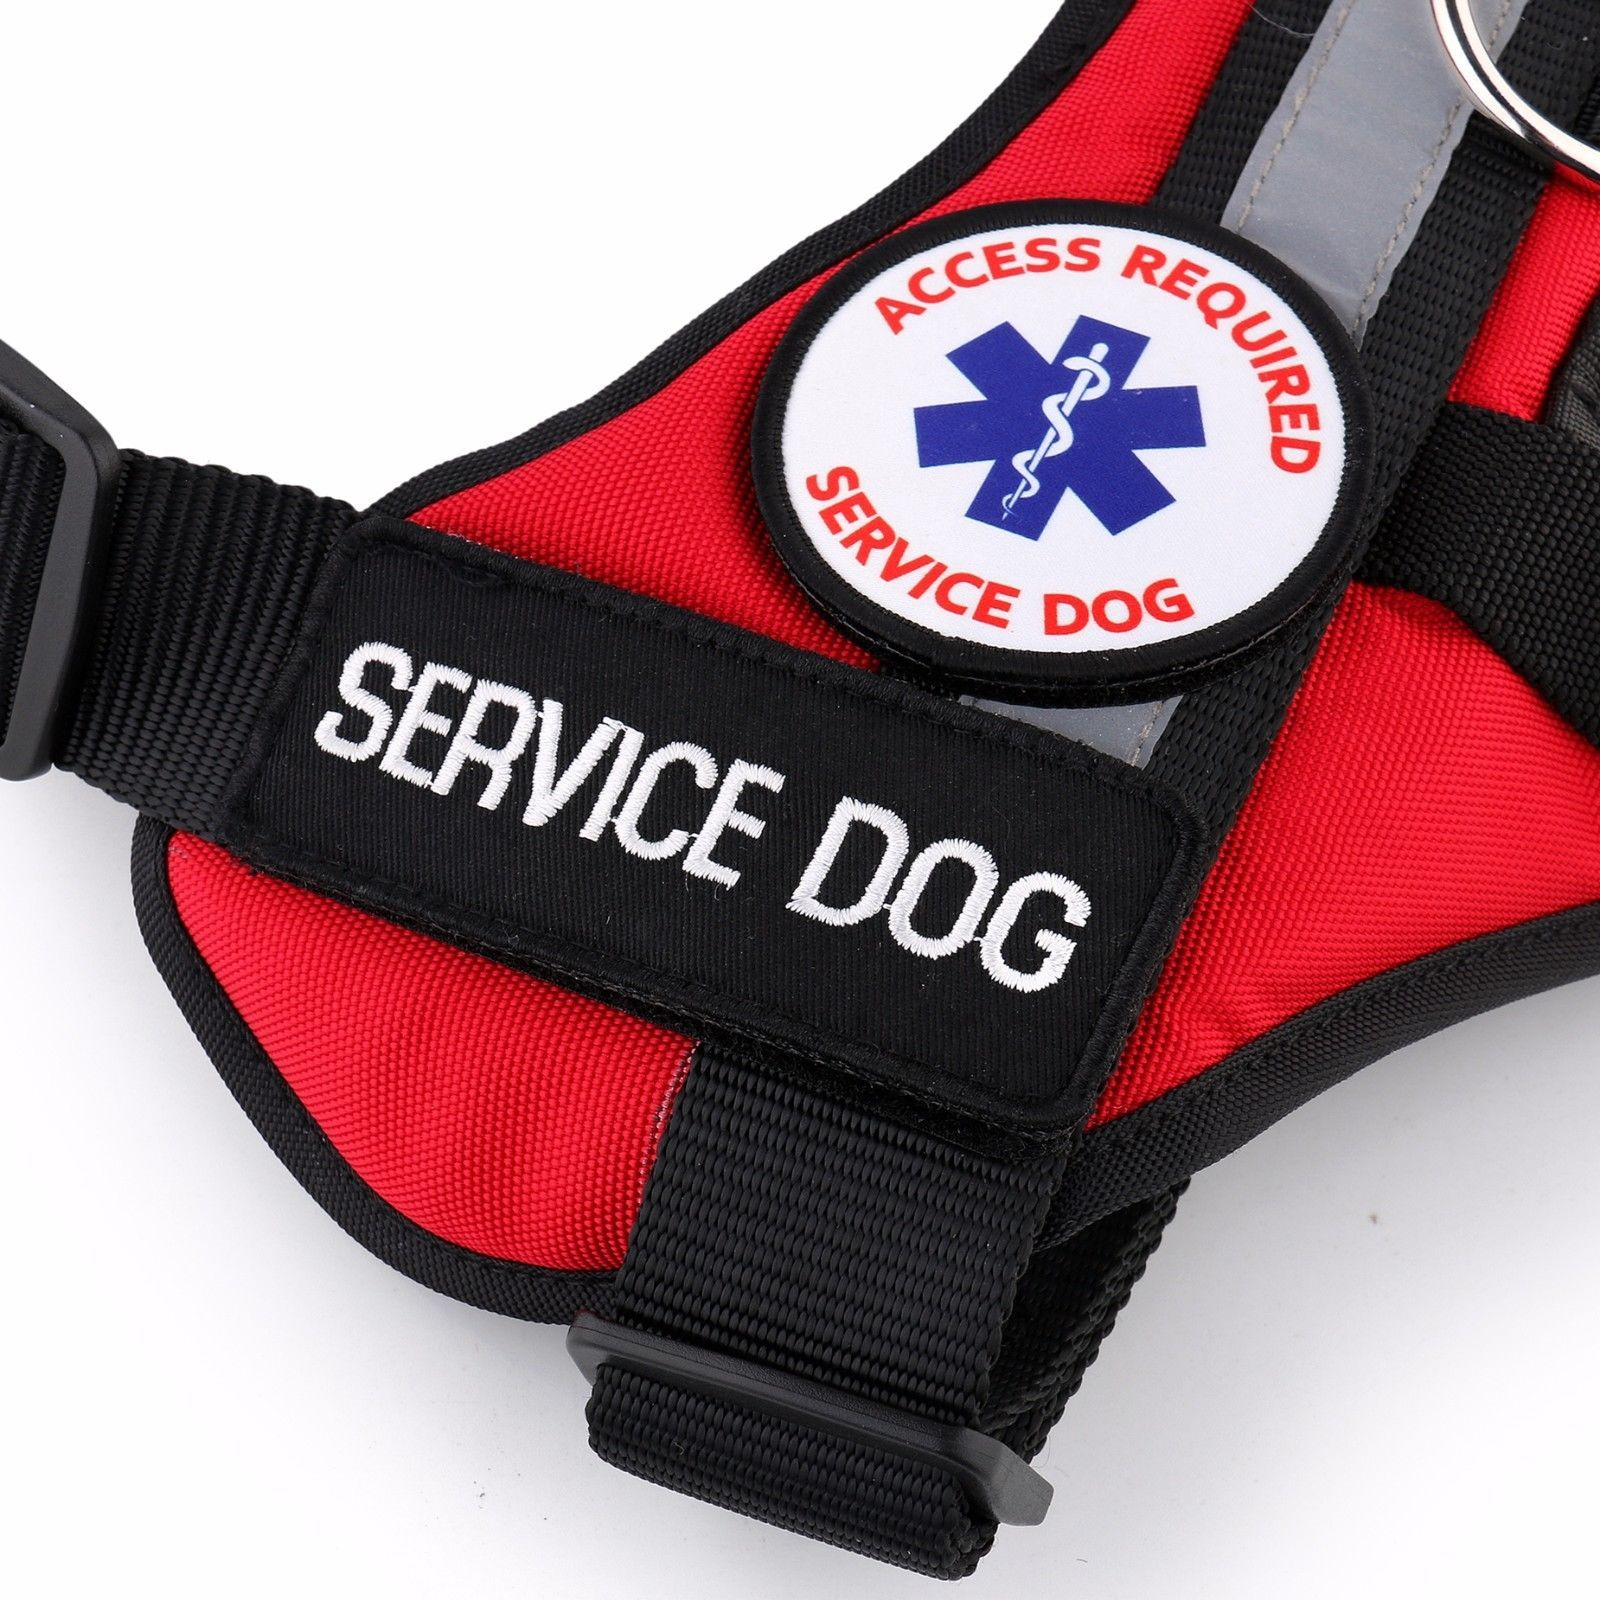 ALL ACCESS CANINE Service Dog ESA Dog Therapy Dog